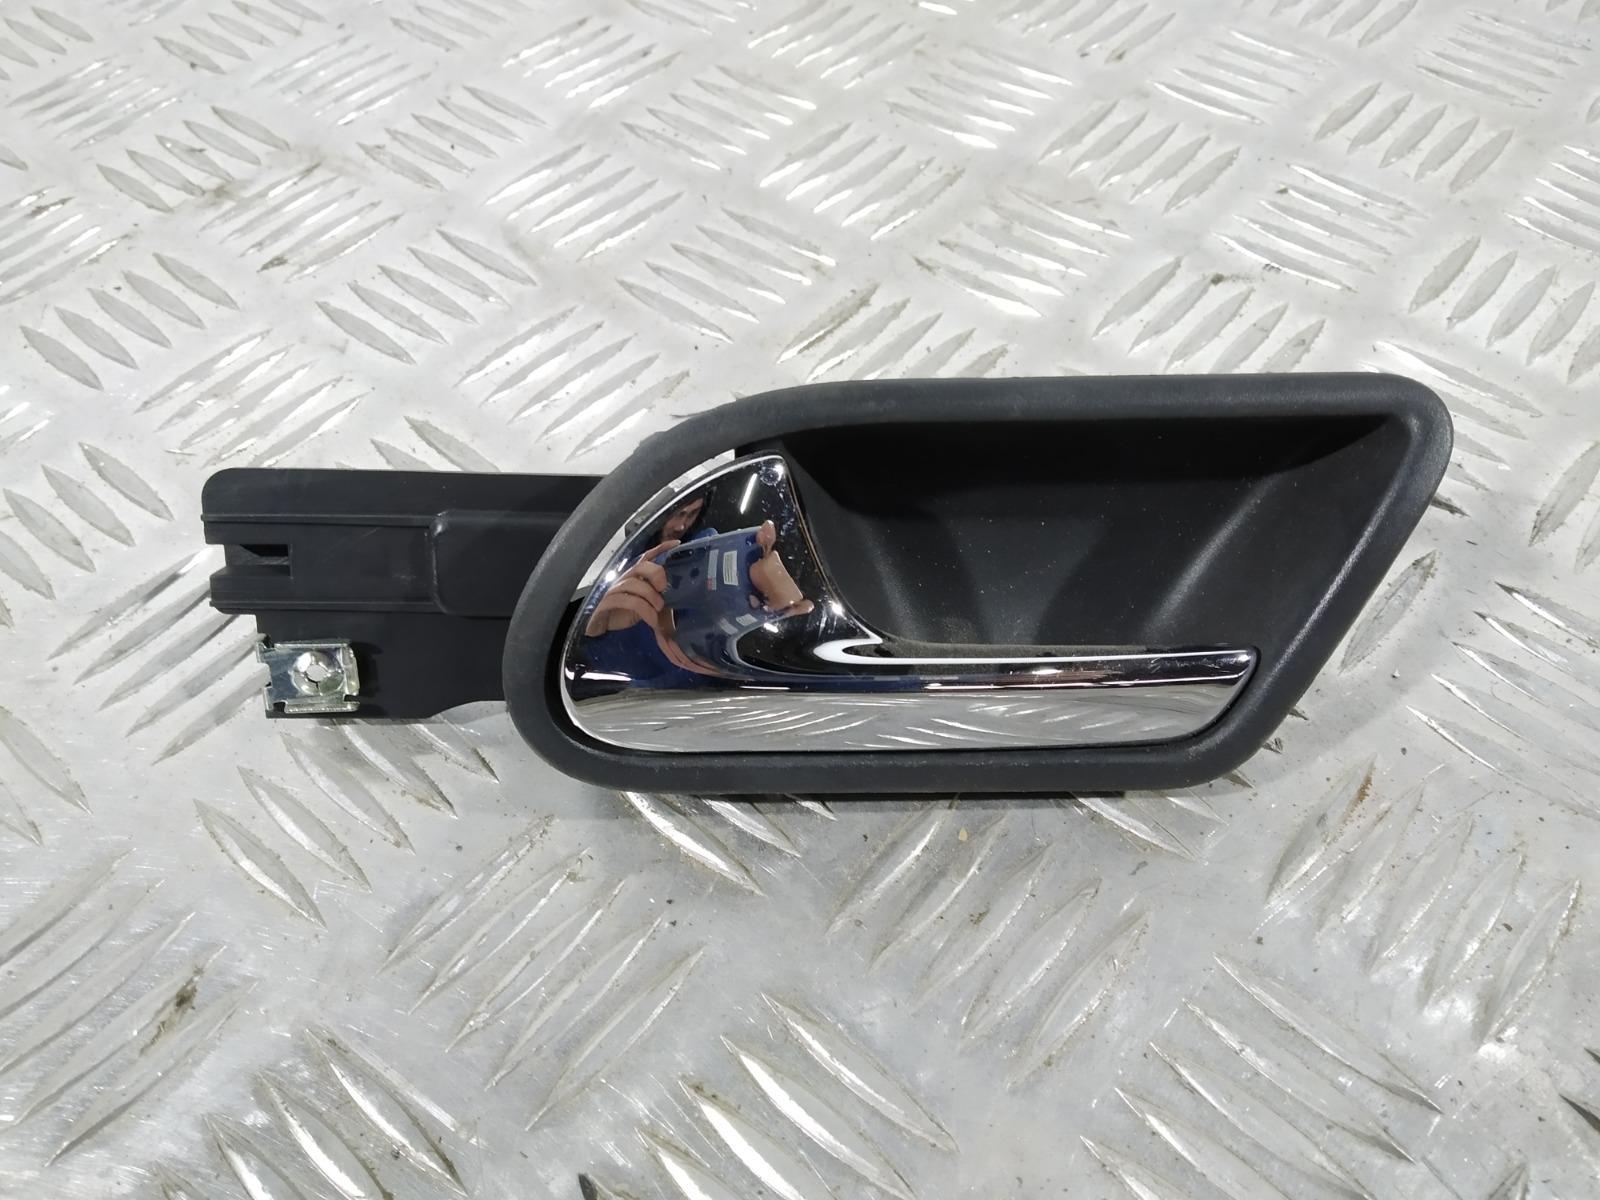 Ручка внутренняя передняя левая Volkswagen Golf 5 1.6 FSI 2006 (б/у)